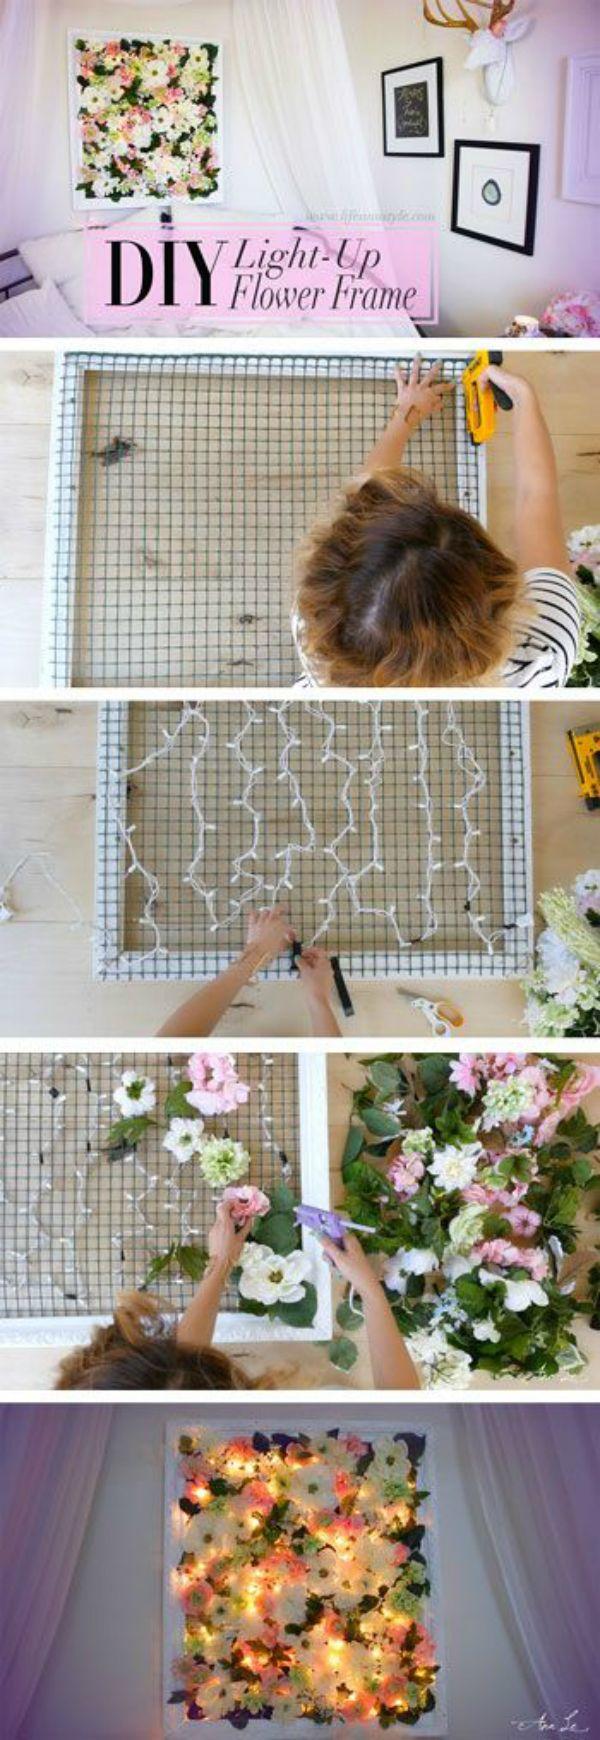 Amei essa ideia floral